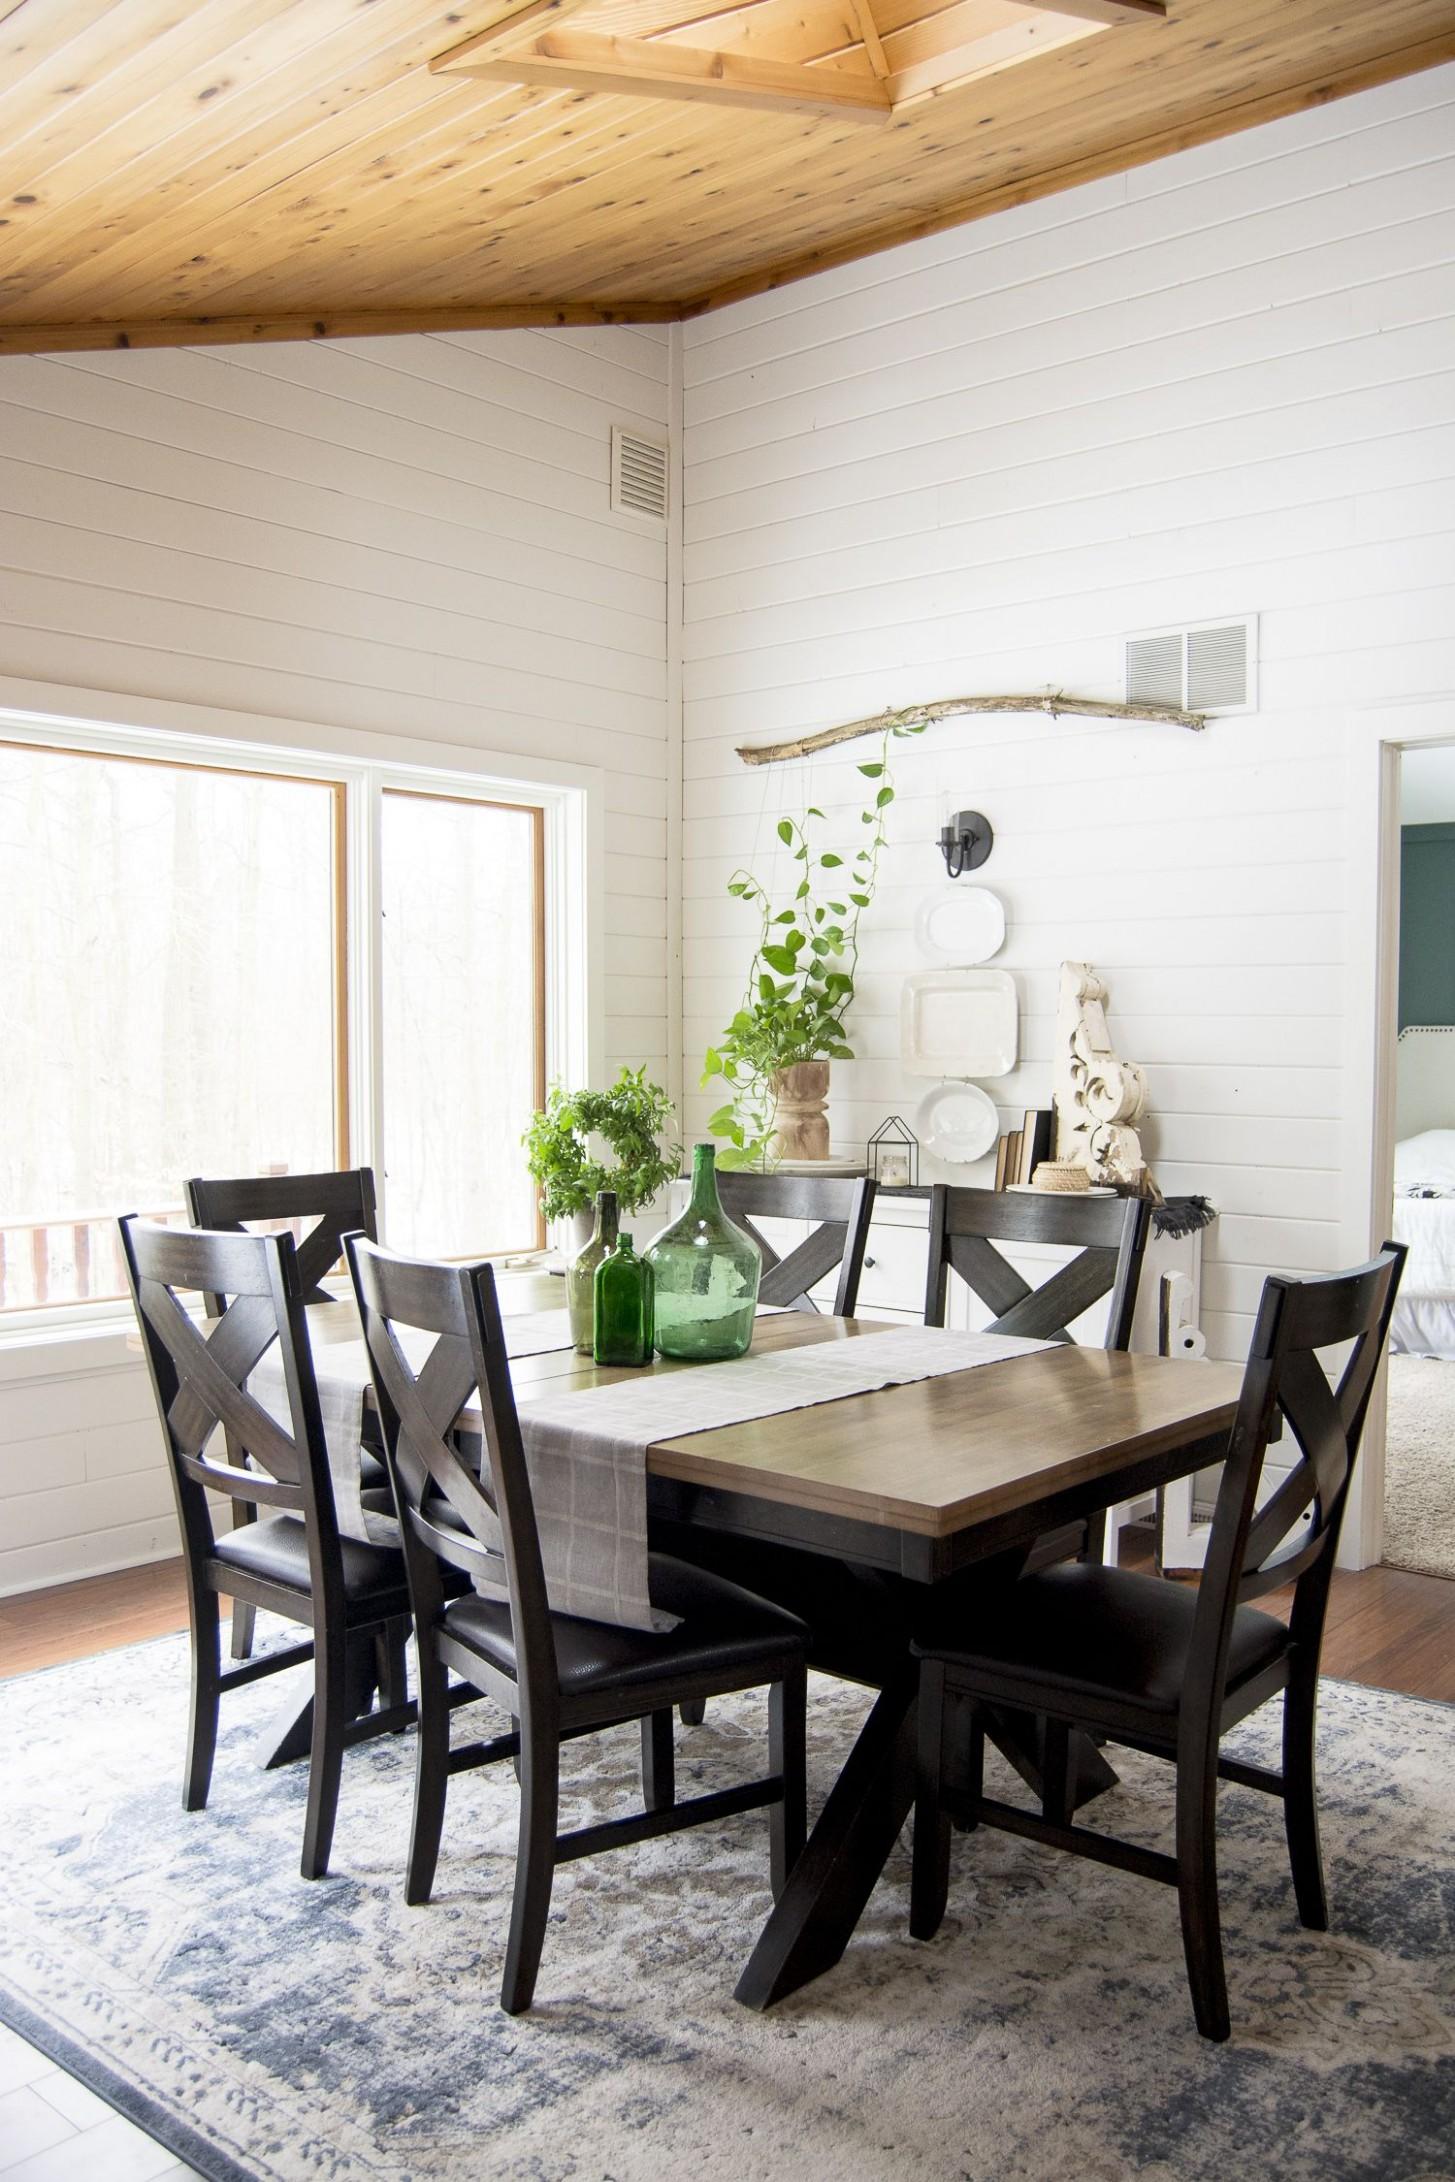 Winter to Spring Dining Room Decor Ideas  Dining room accessories  - Dining Room Ideas Simple